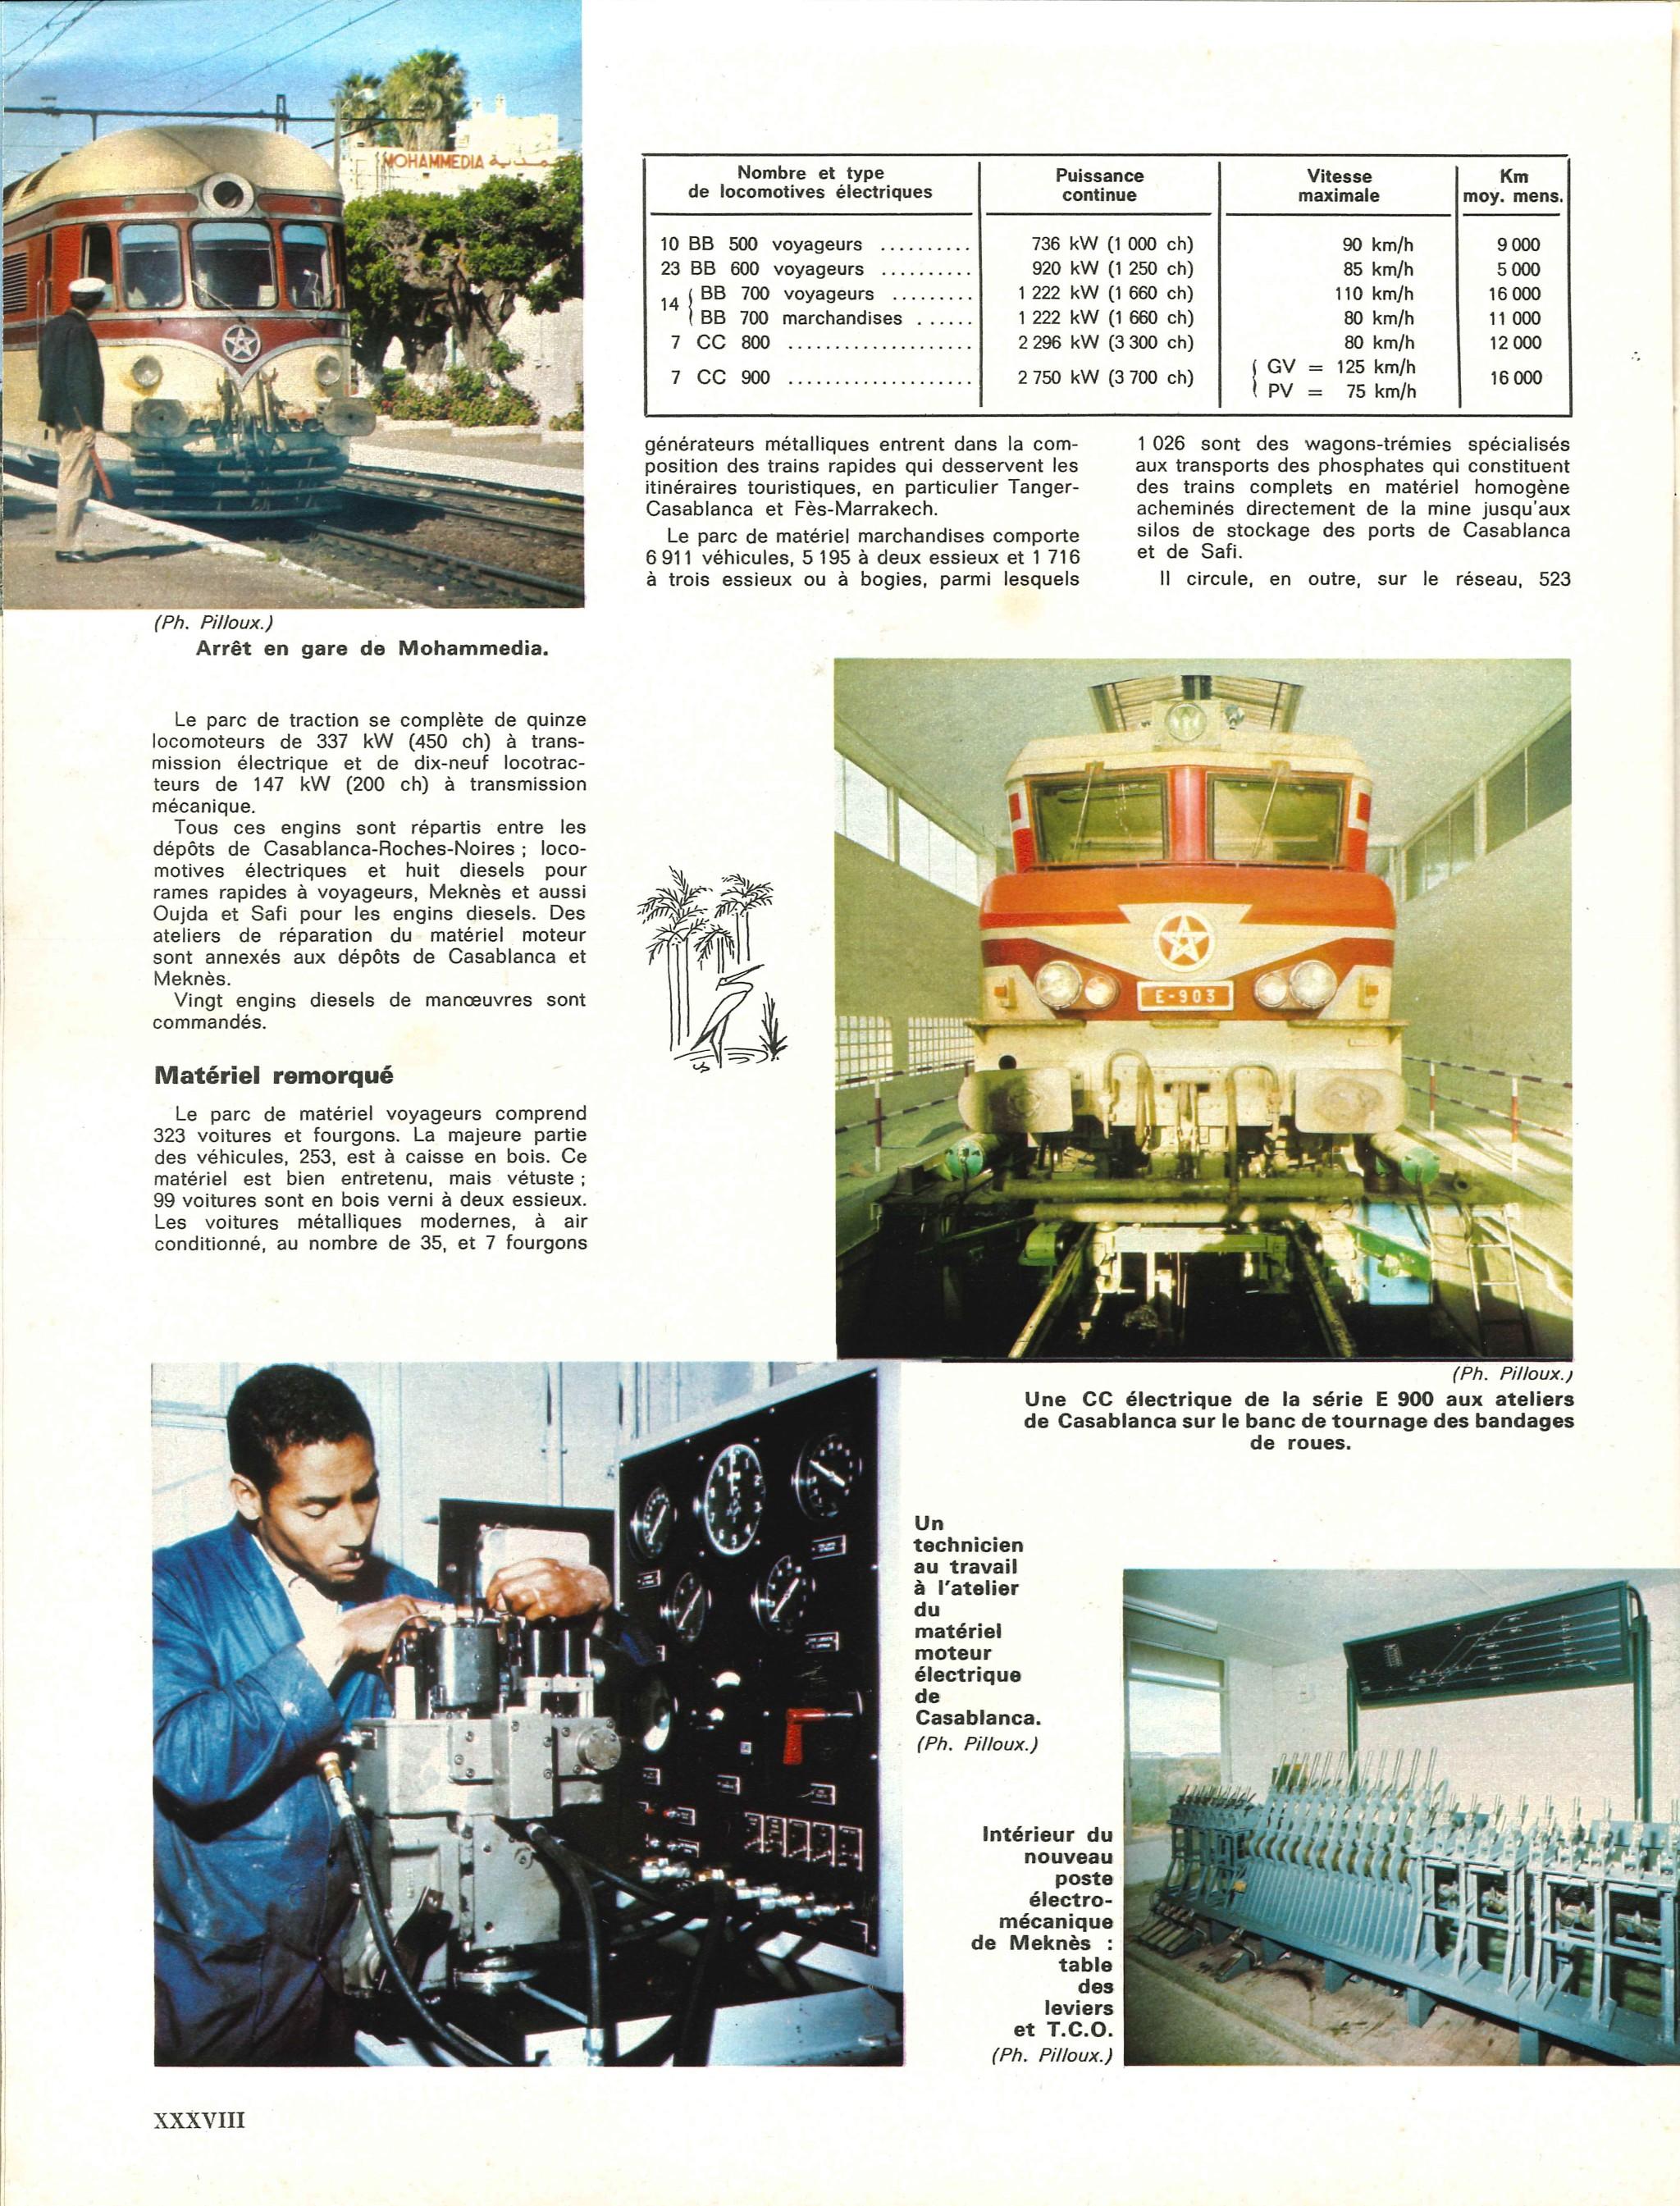 Chemins de Fer au Maroc - ONCF  - Page 2 49429346863_b9599ddf94_3k